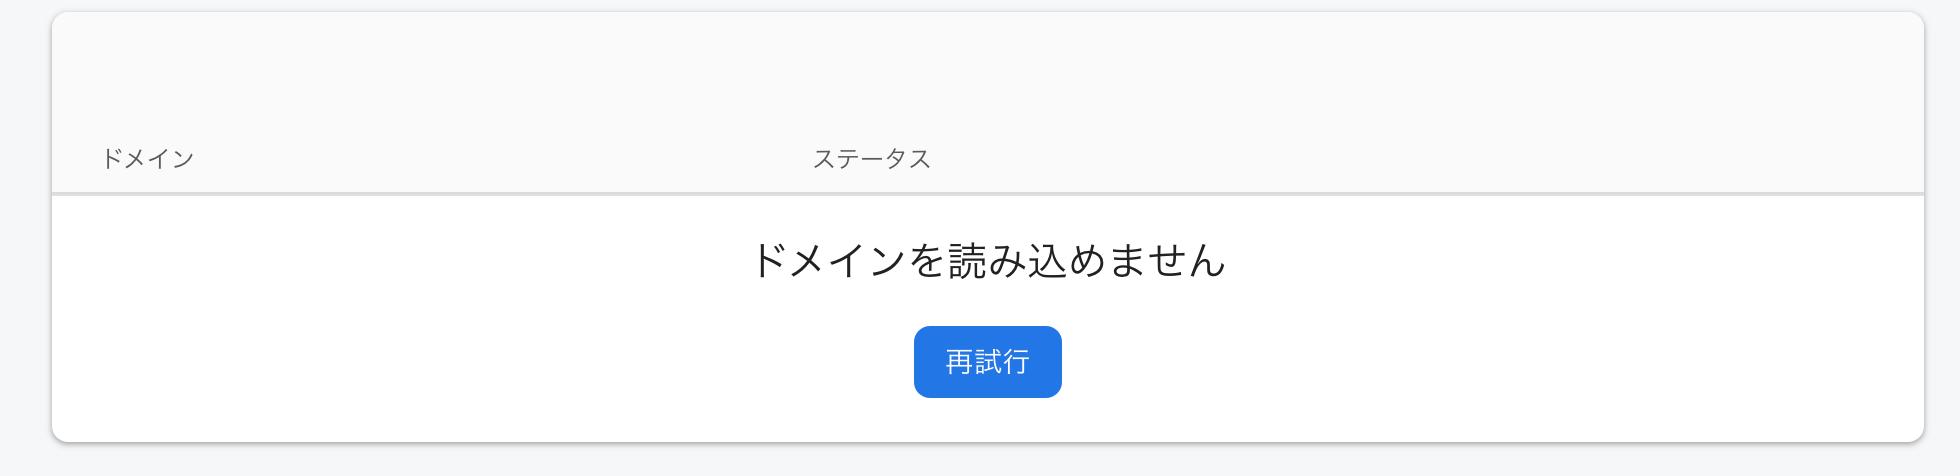 [Firebase] Hosting ドメインの所有権を再確認してください メールが来た